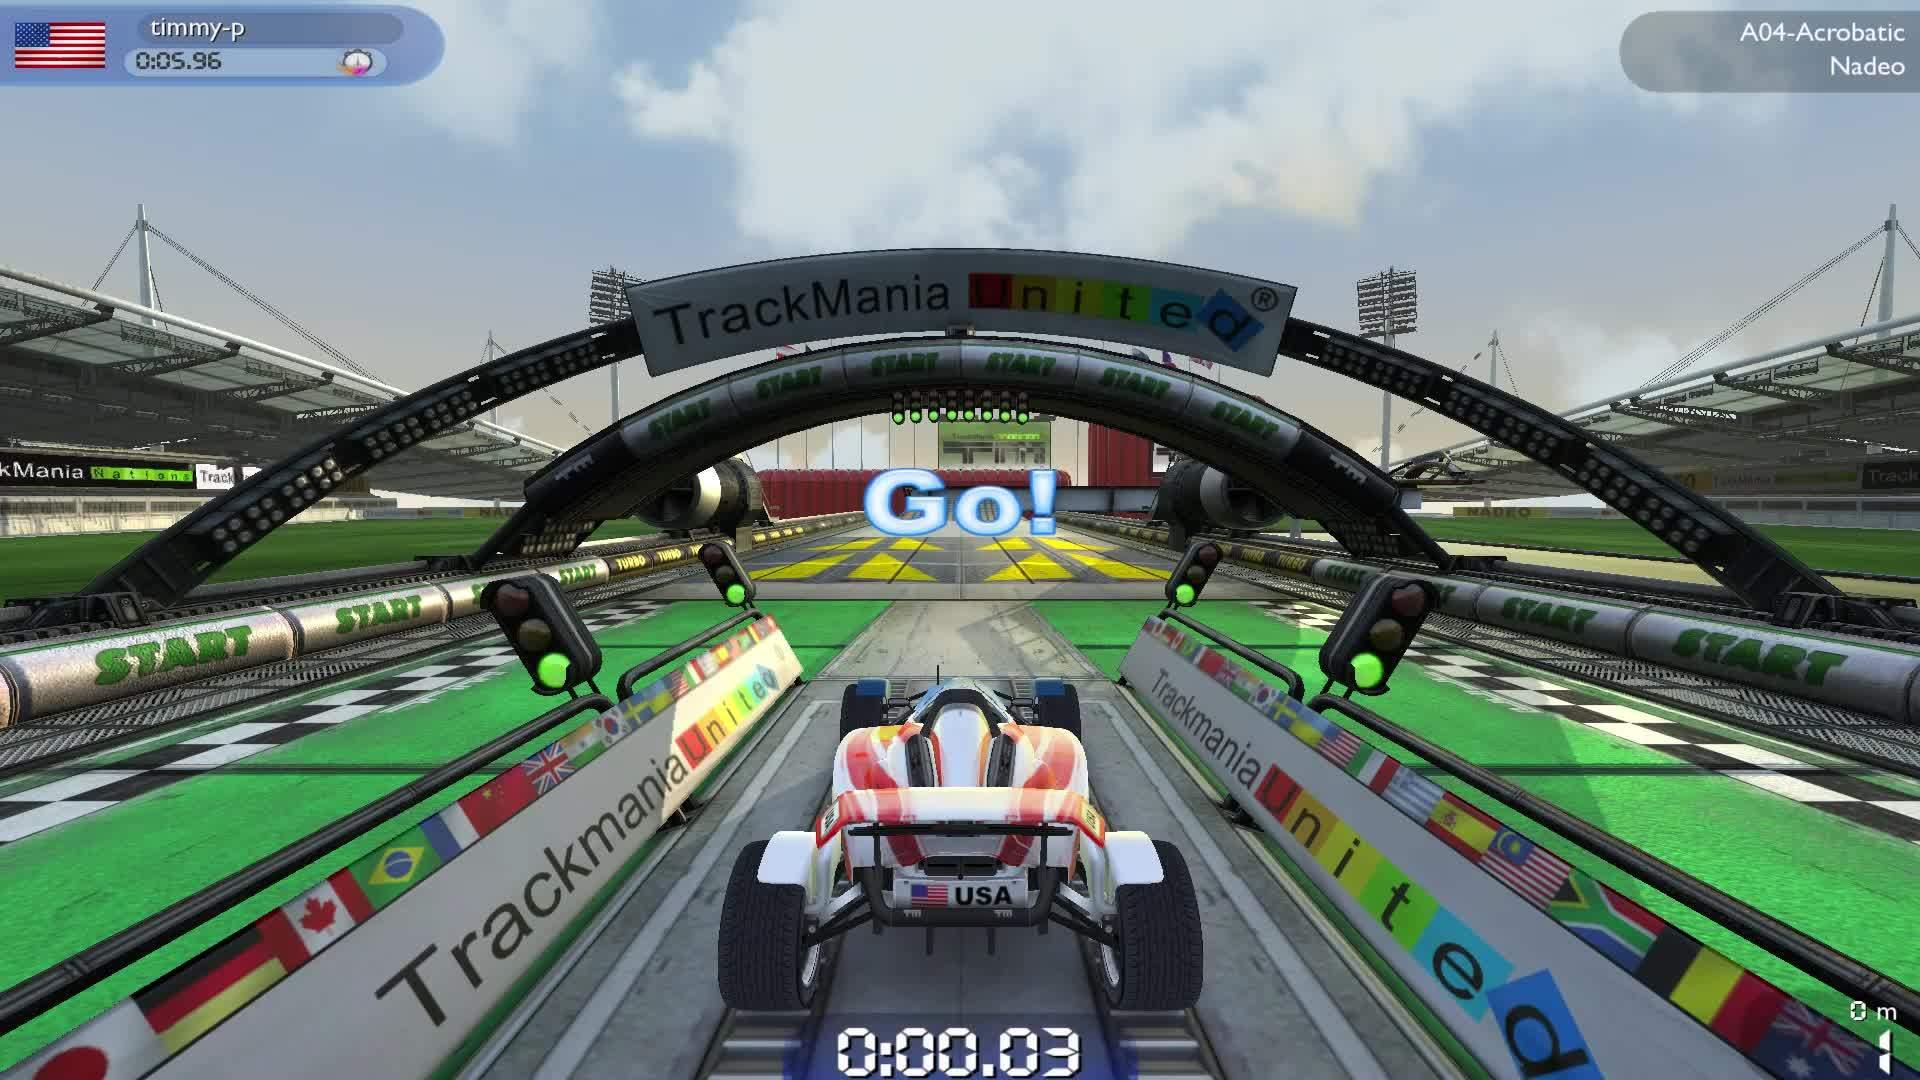 Trackmania, gamephysics, videogamestunts, Trackmania stone skipping GIFs